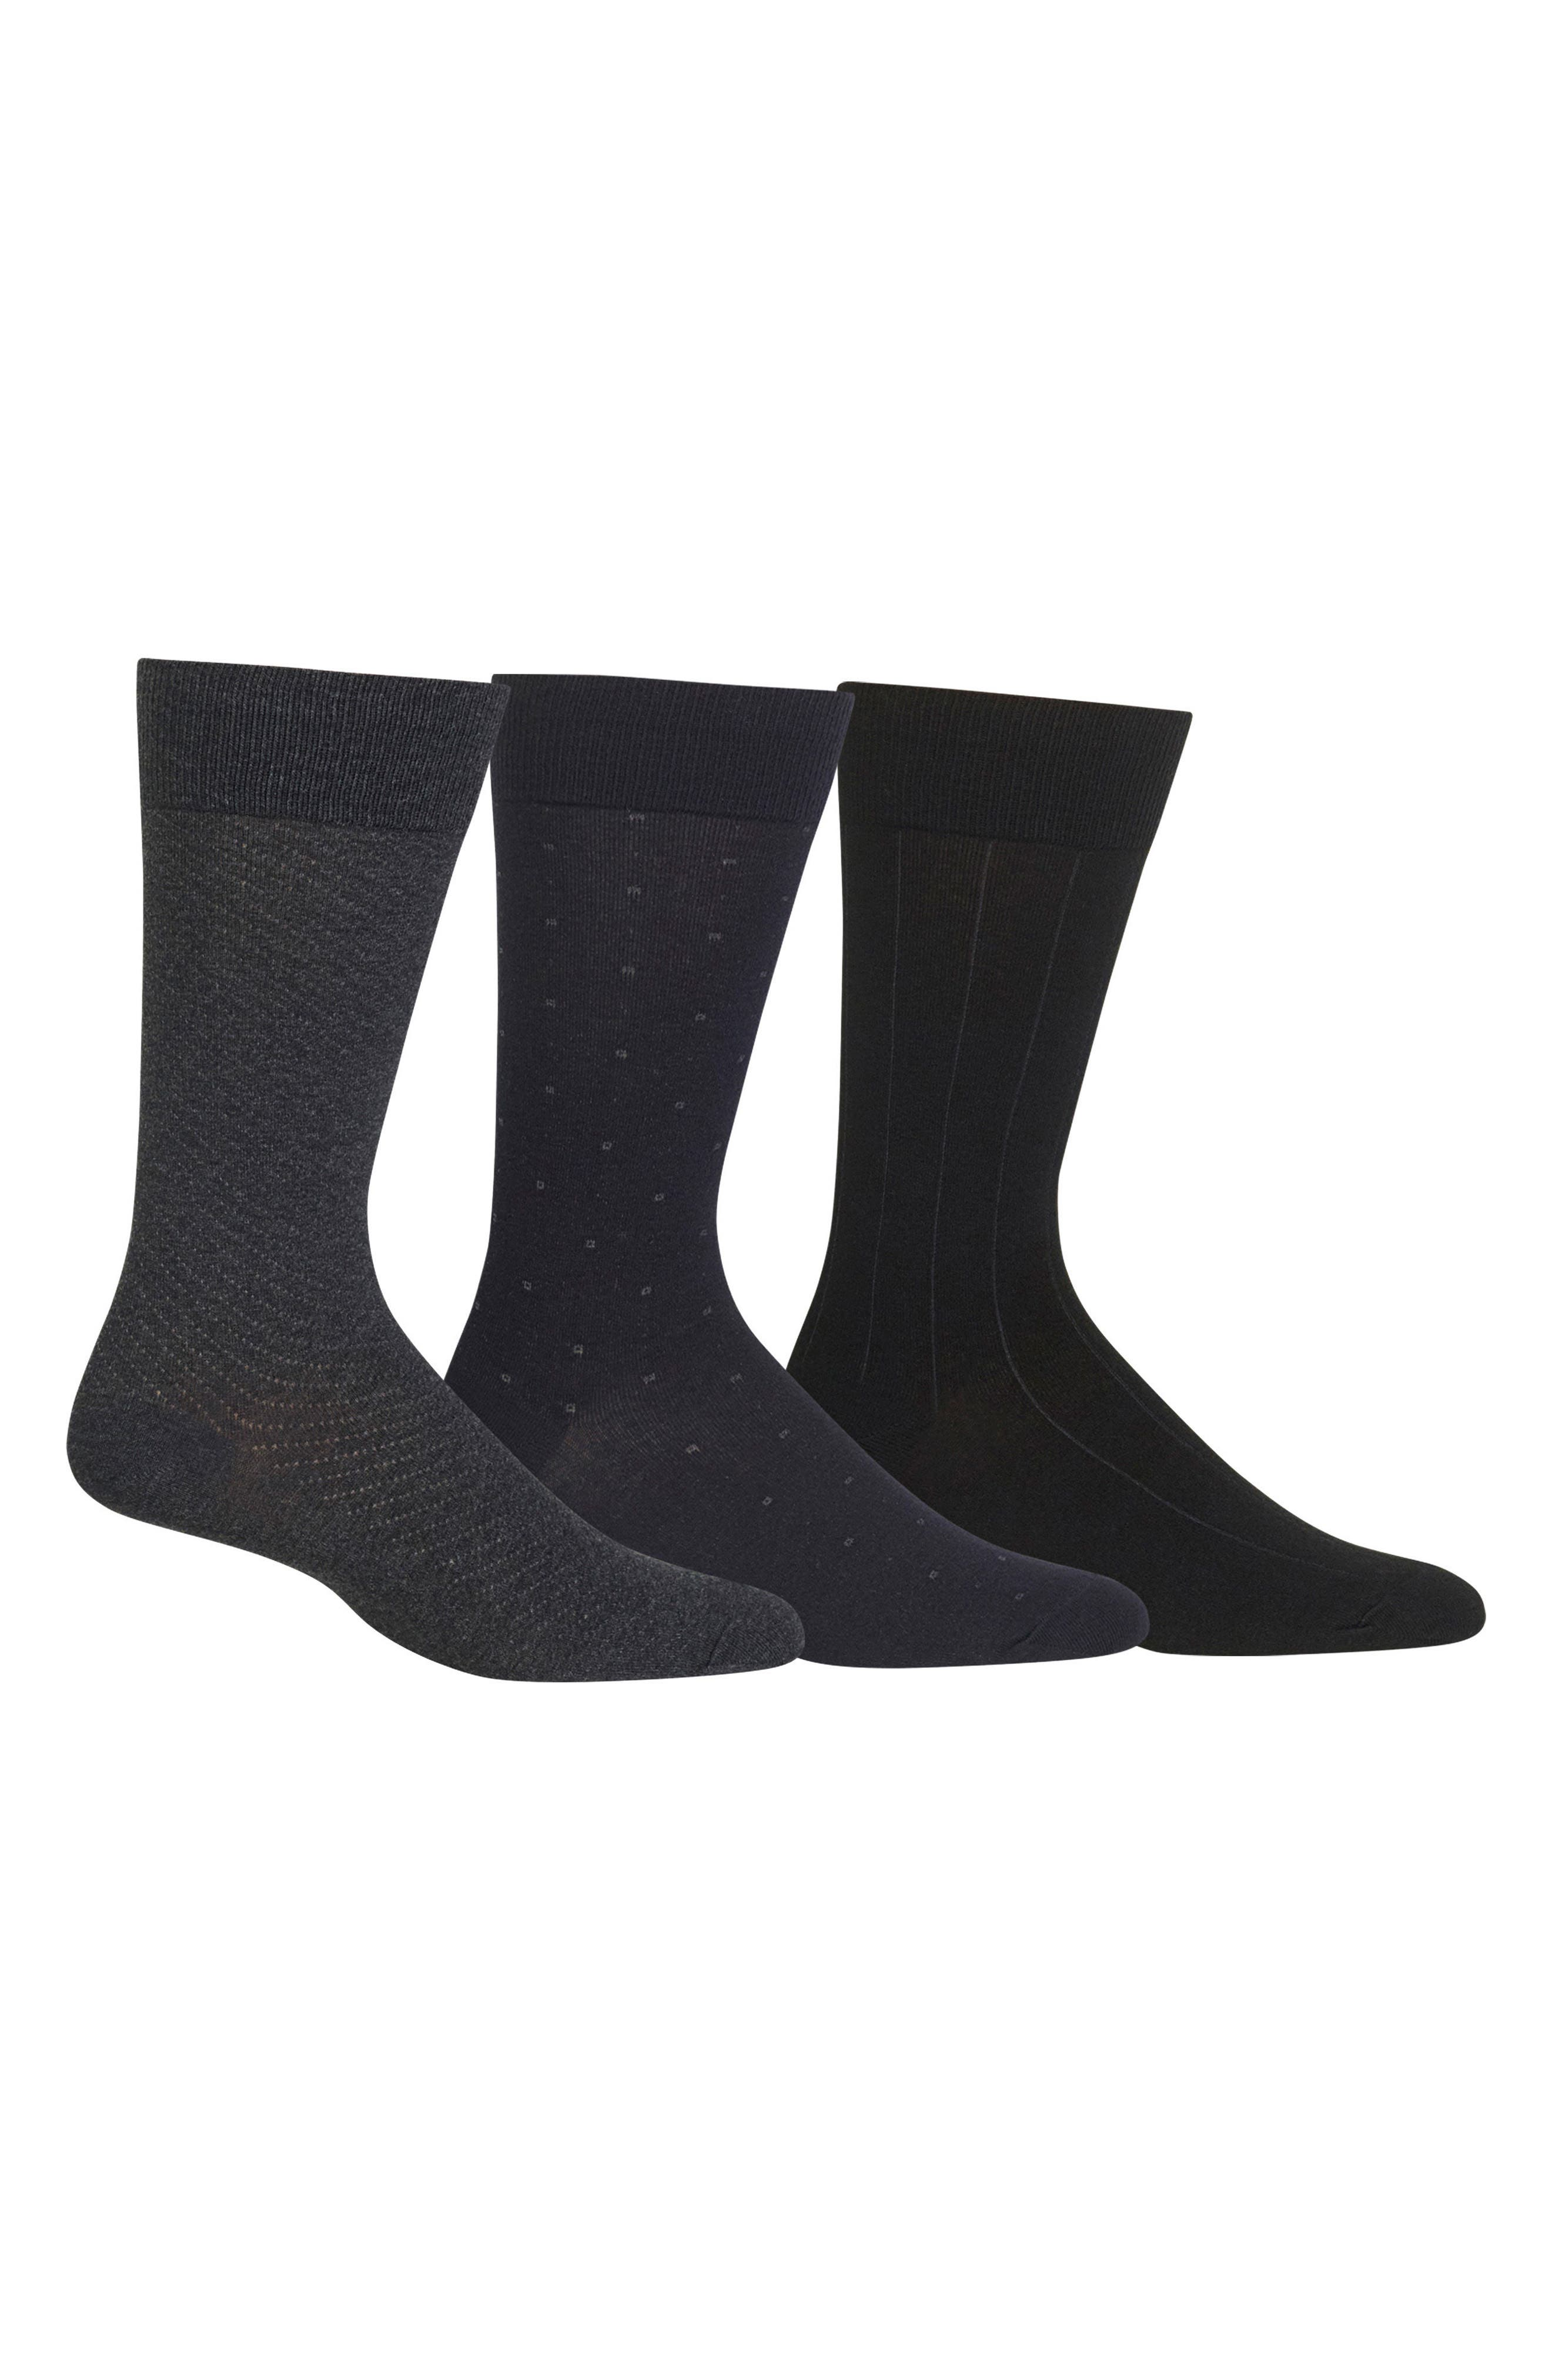 Dress Socks,                         Main,                         color, Charcoal Heather/ Navy/ Black